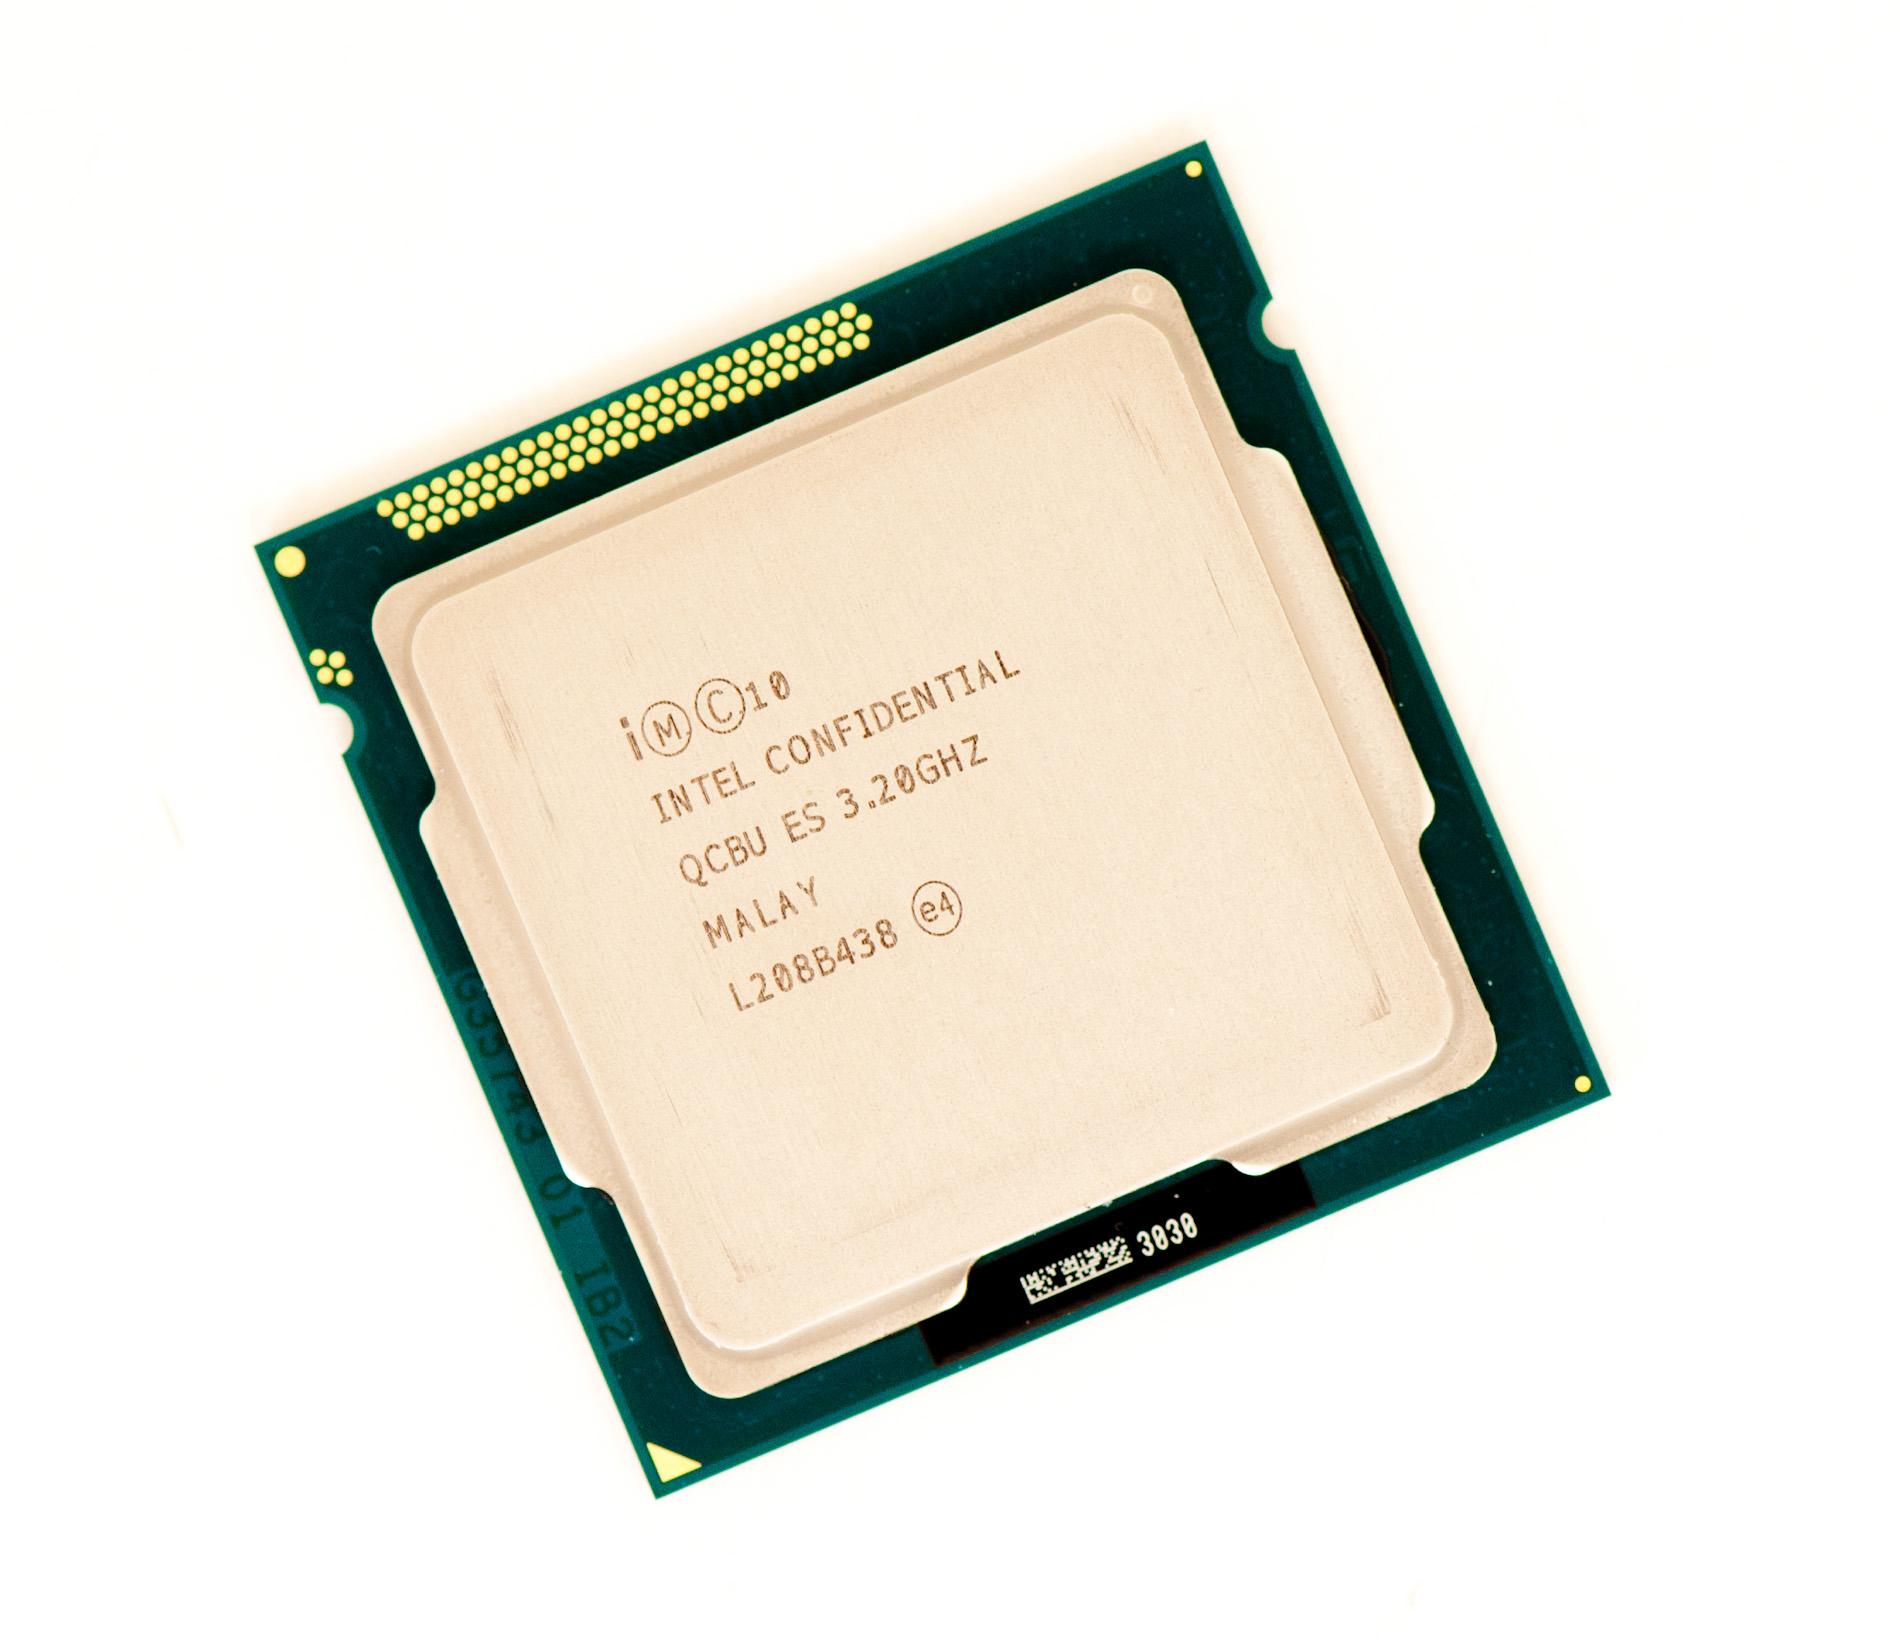 I5 3470 driver intel core graphics